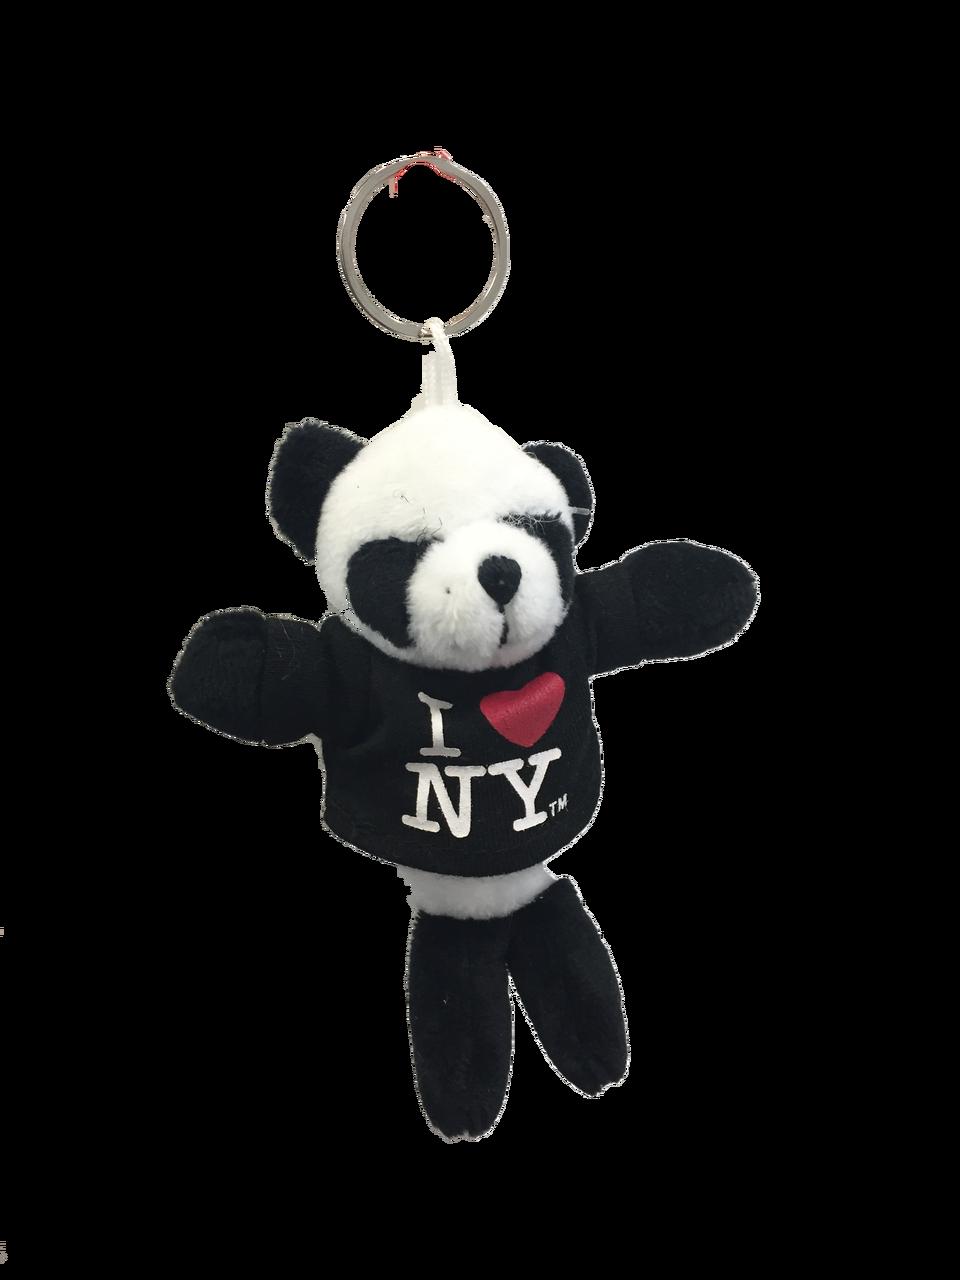 I Love Ny Panda Bear Plush Key Chain